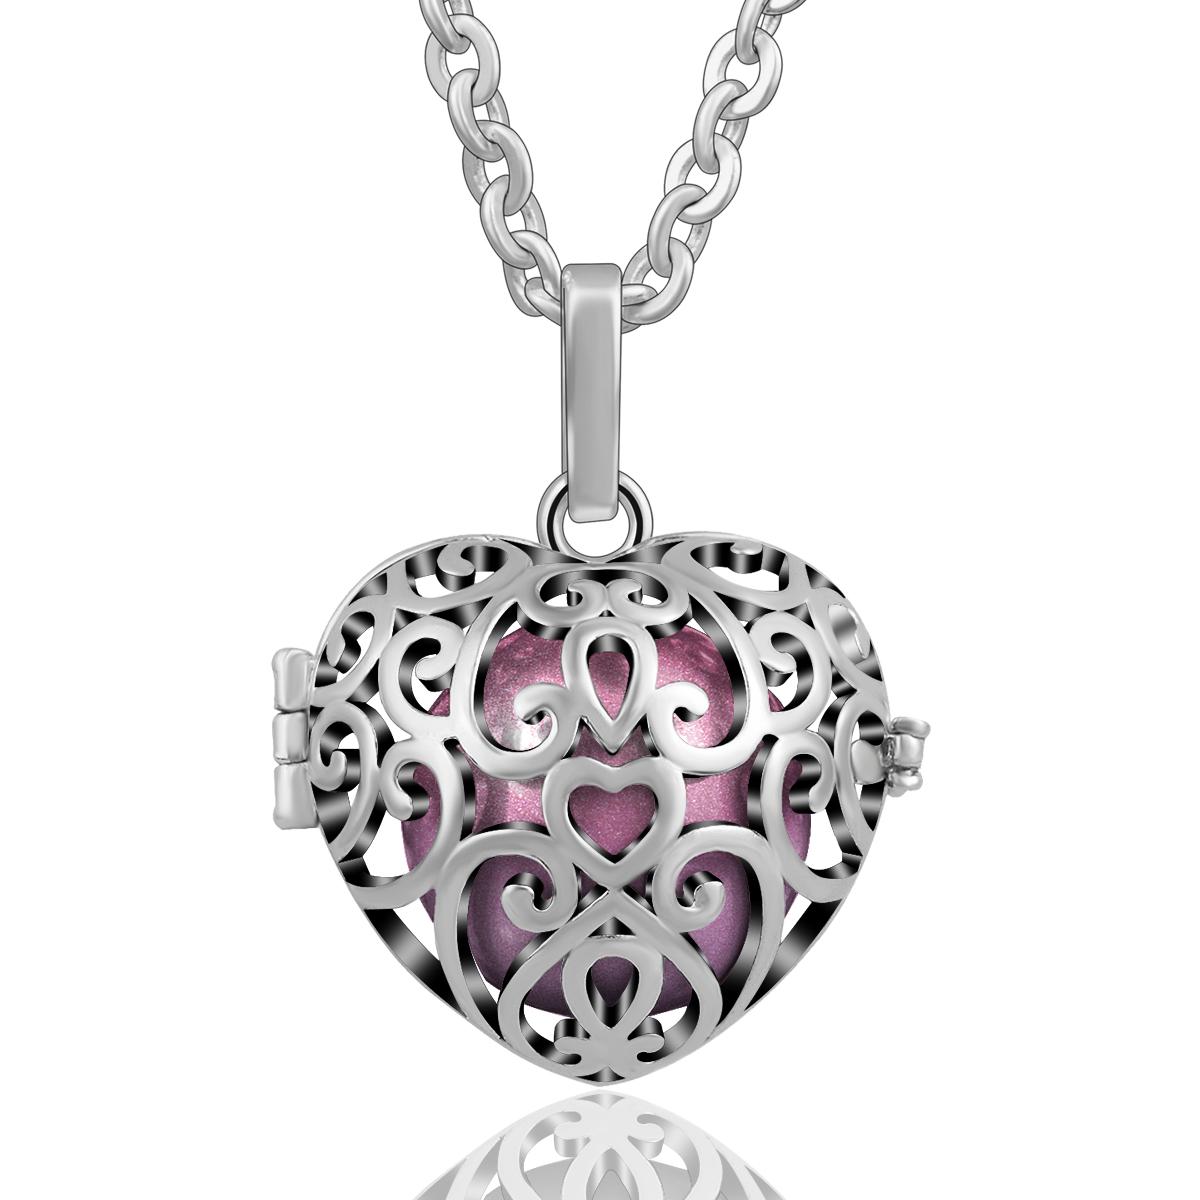 Harmony ball angel caller chain pendant necklace women baby chime harmony ball angel caller chain pendant necklace women mozeypictures Choice Image